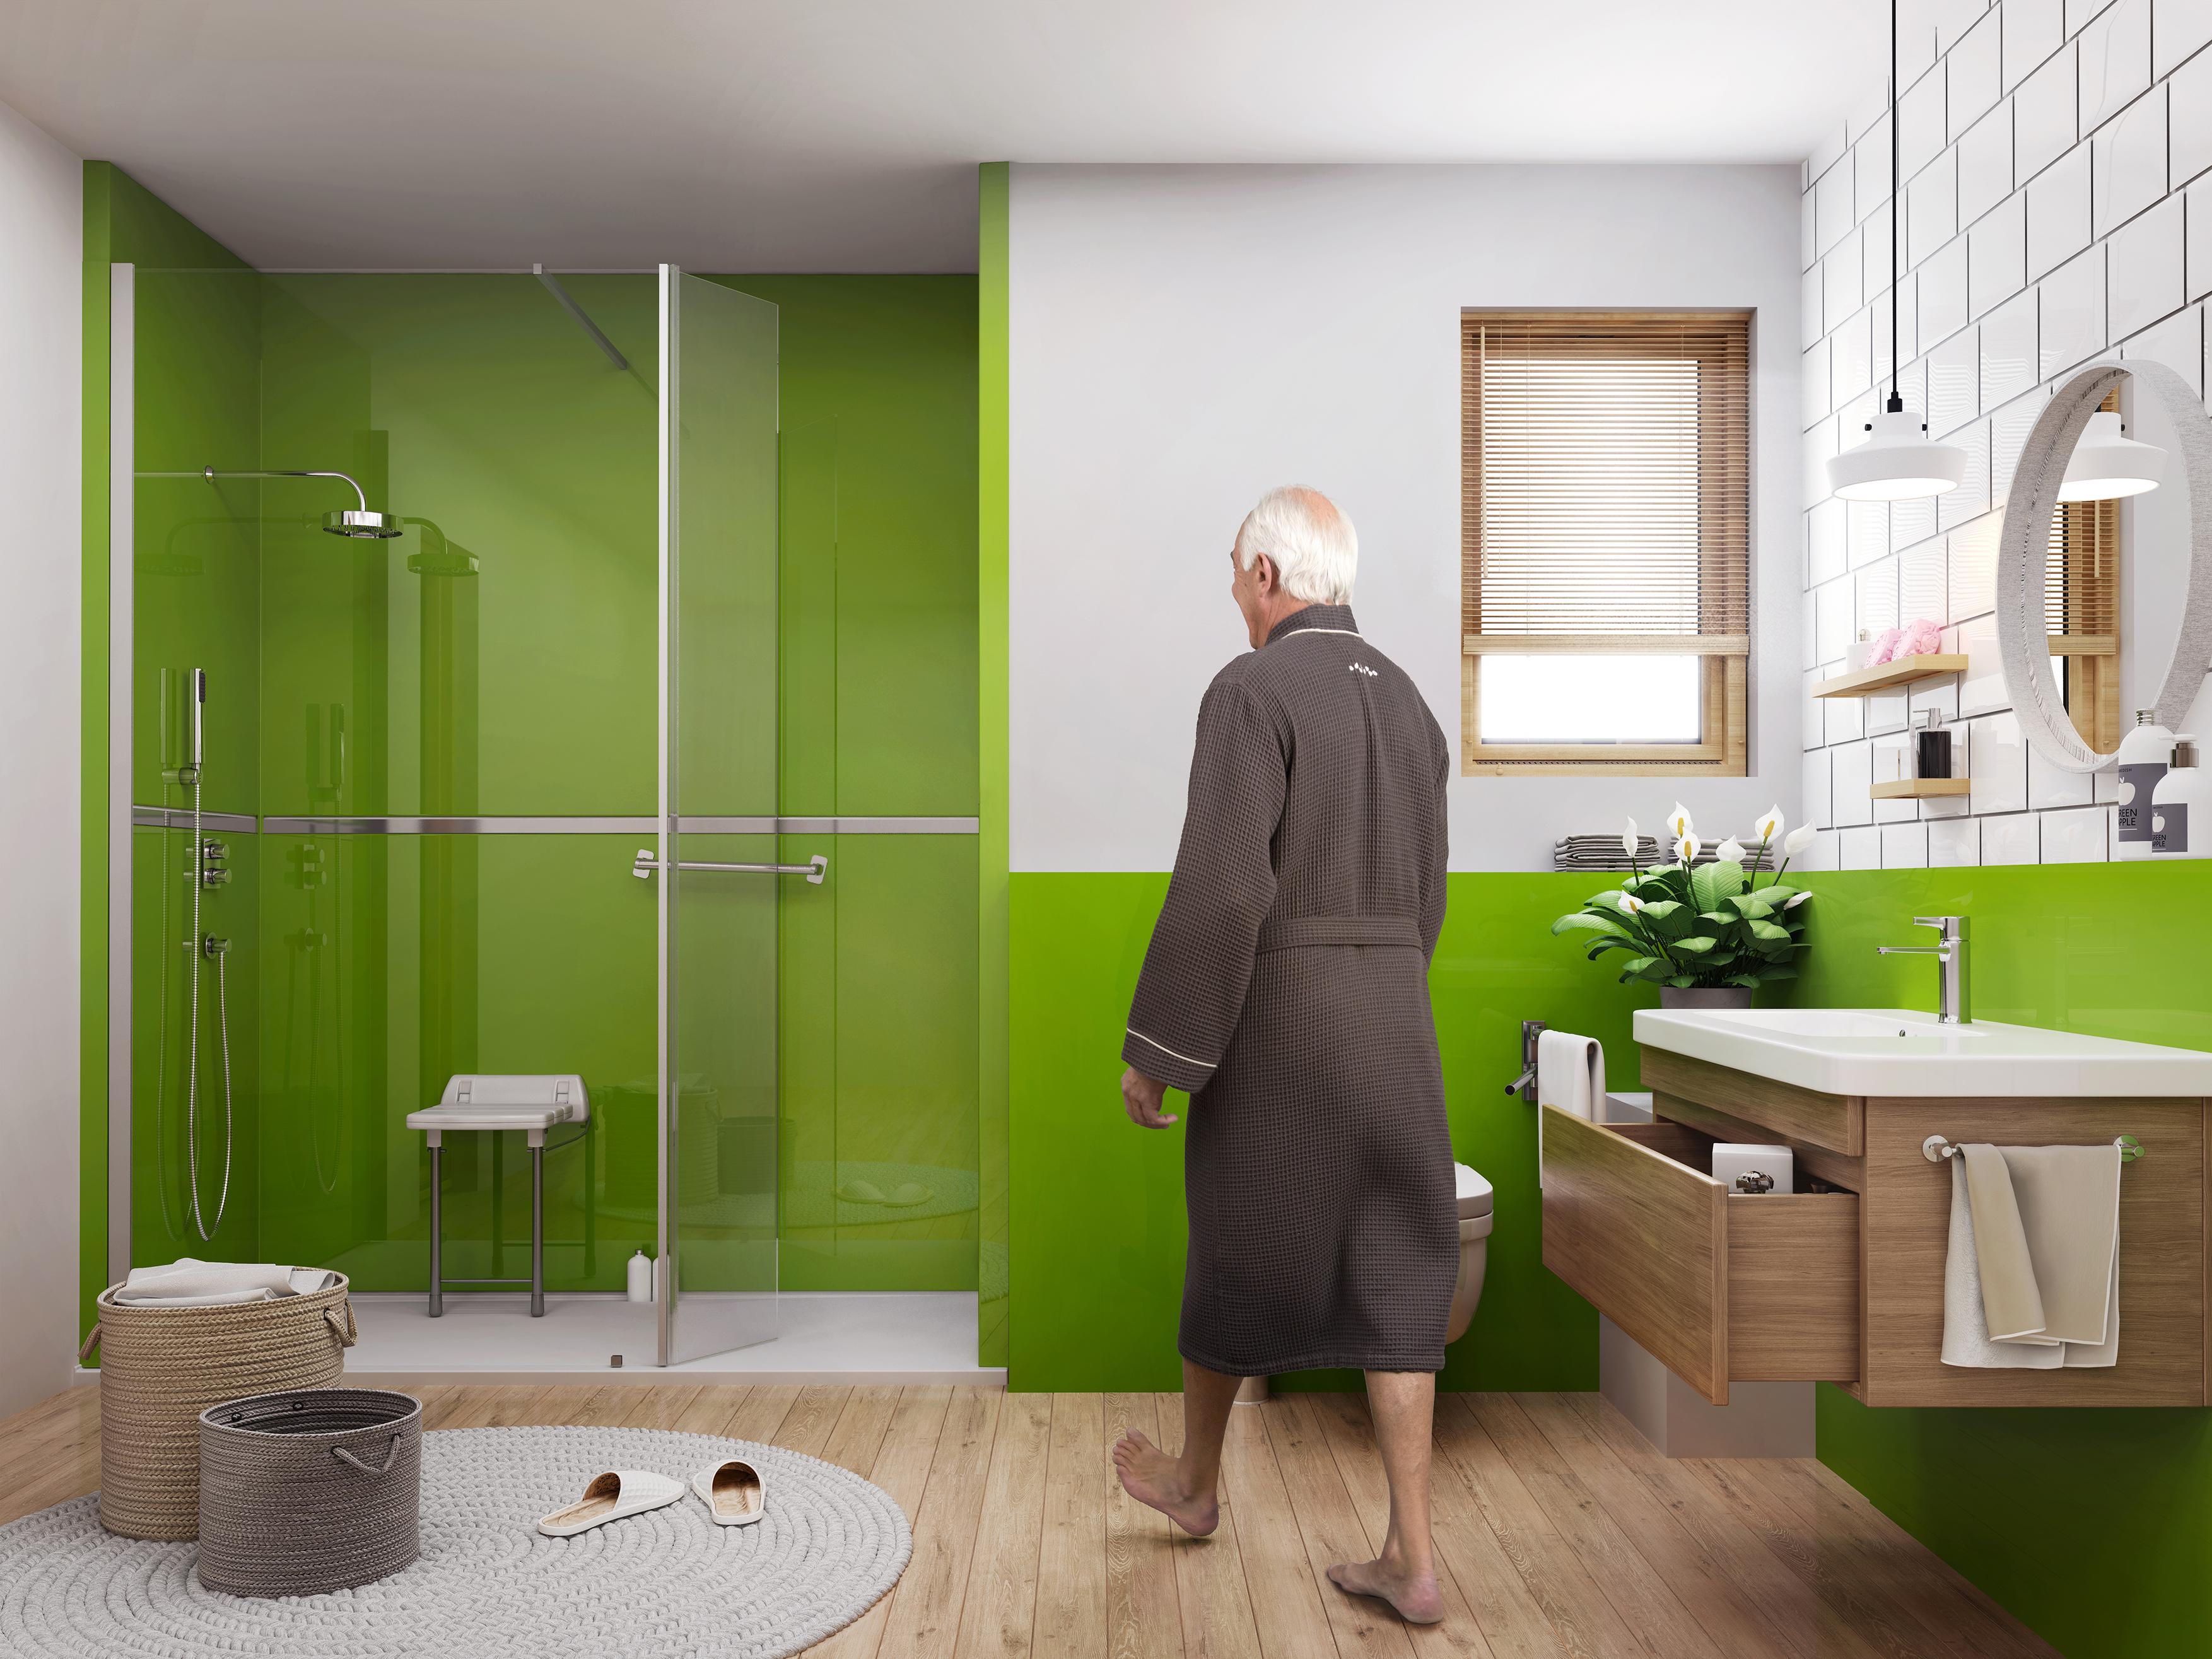 ilea archives c cile roux relations presse. Black Bedroom Furniture Sets. Home Design Ideas